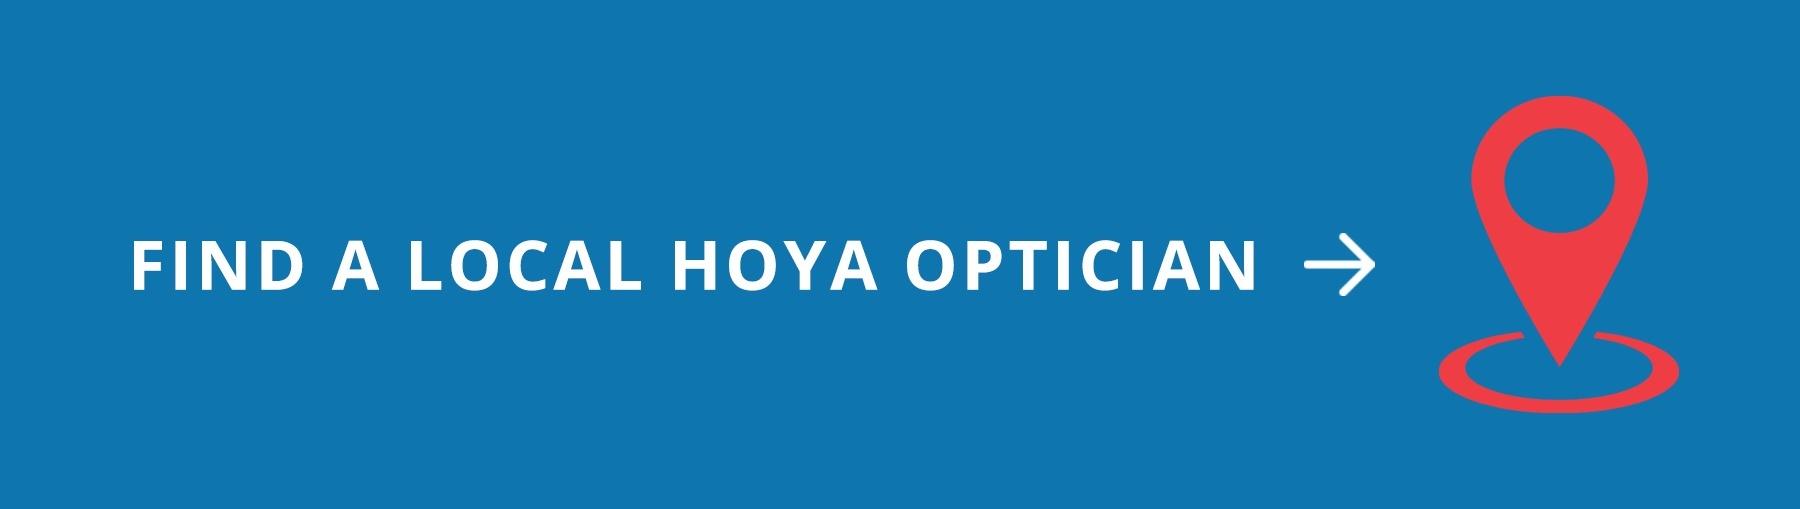 Find a Local Hoya Optician